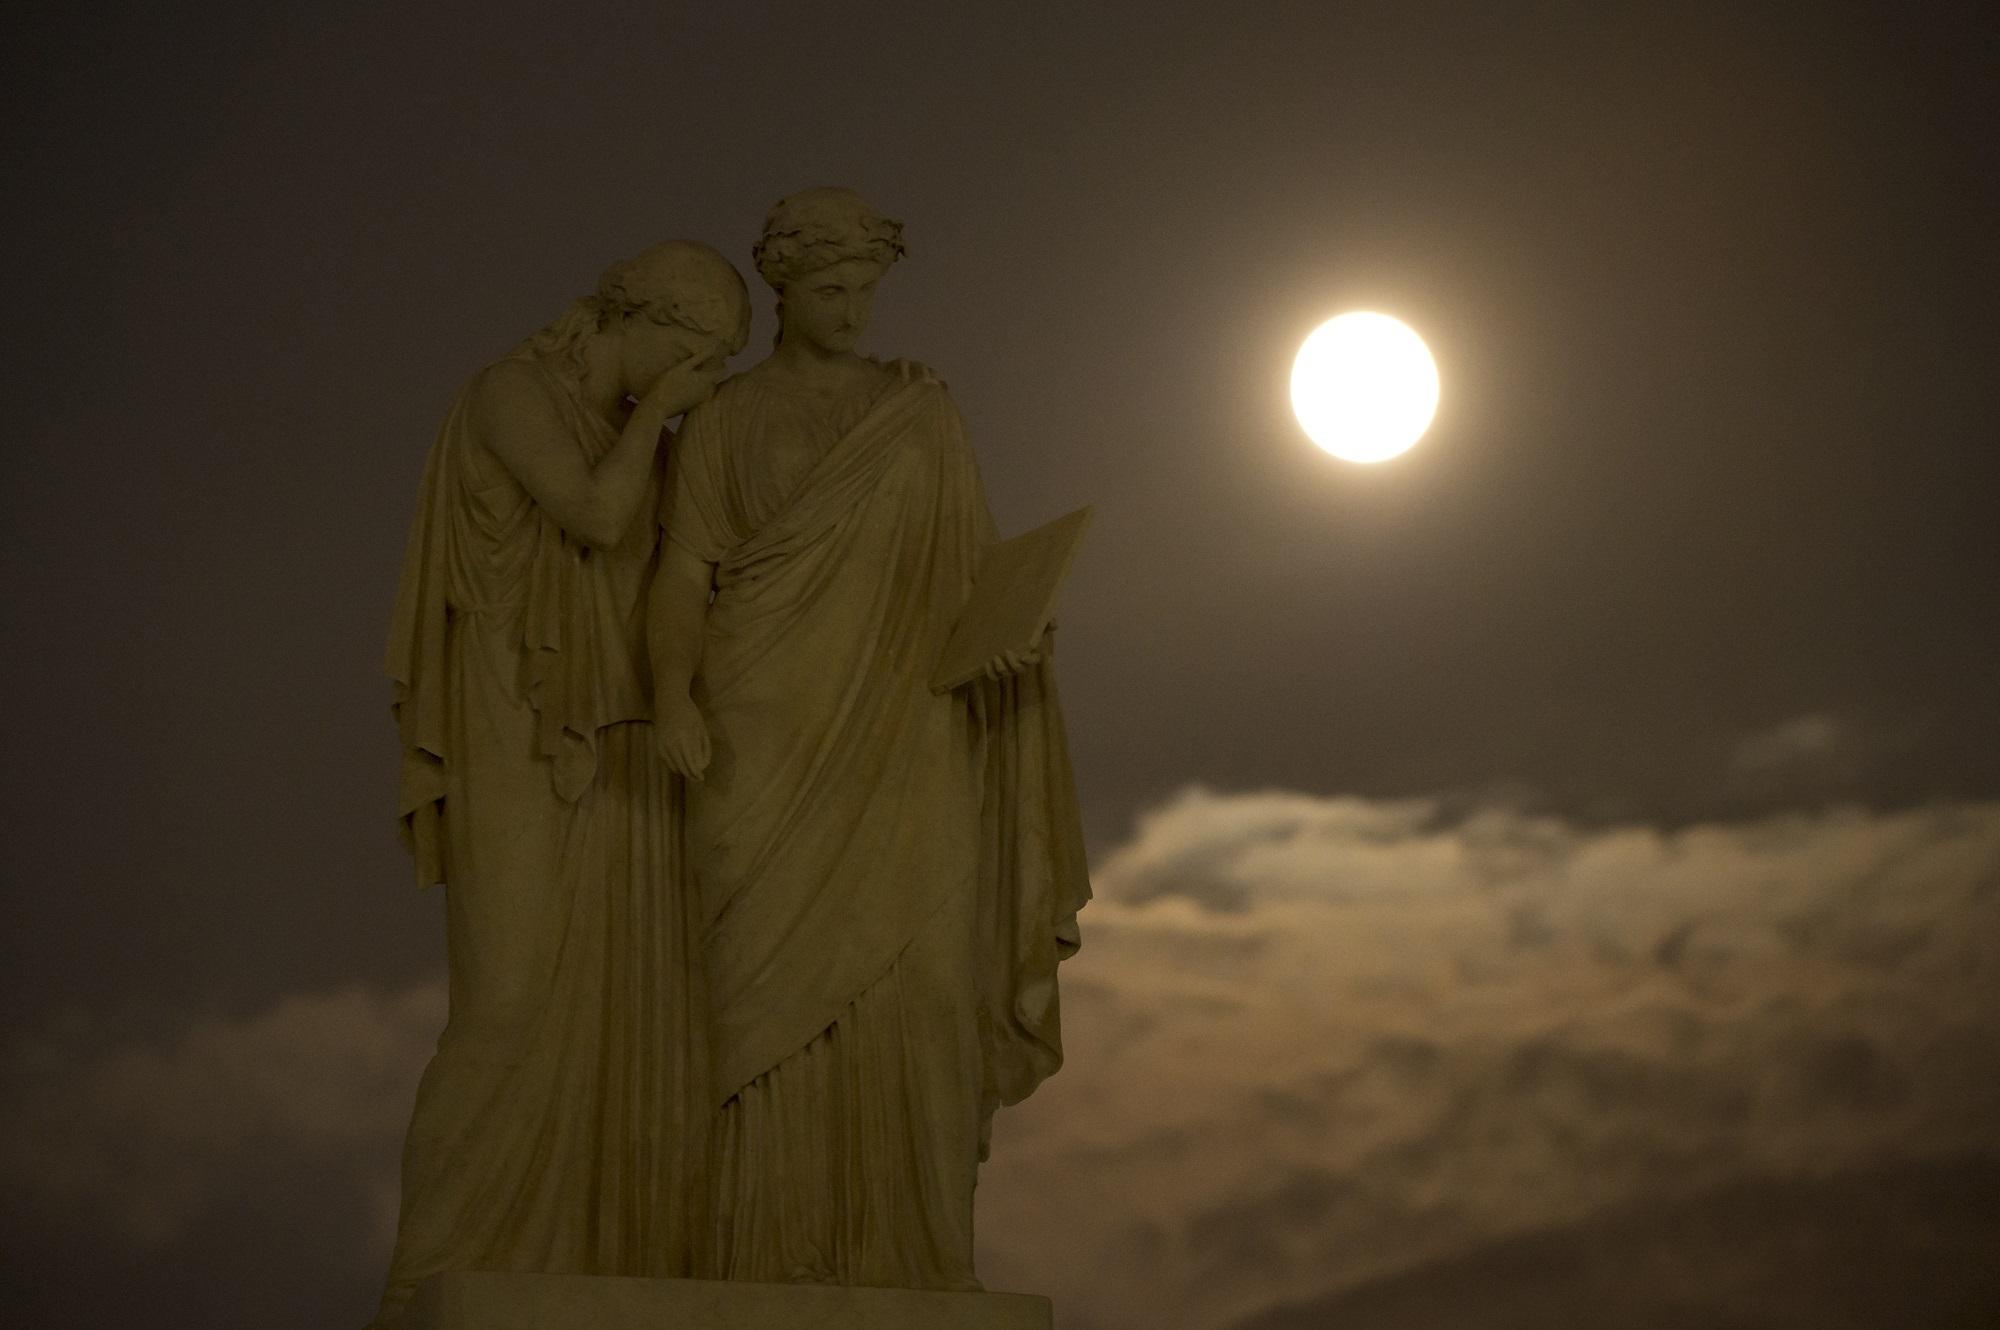 Super Moon, Sculpture, Statue, Super, Night, HQ Photo